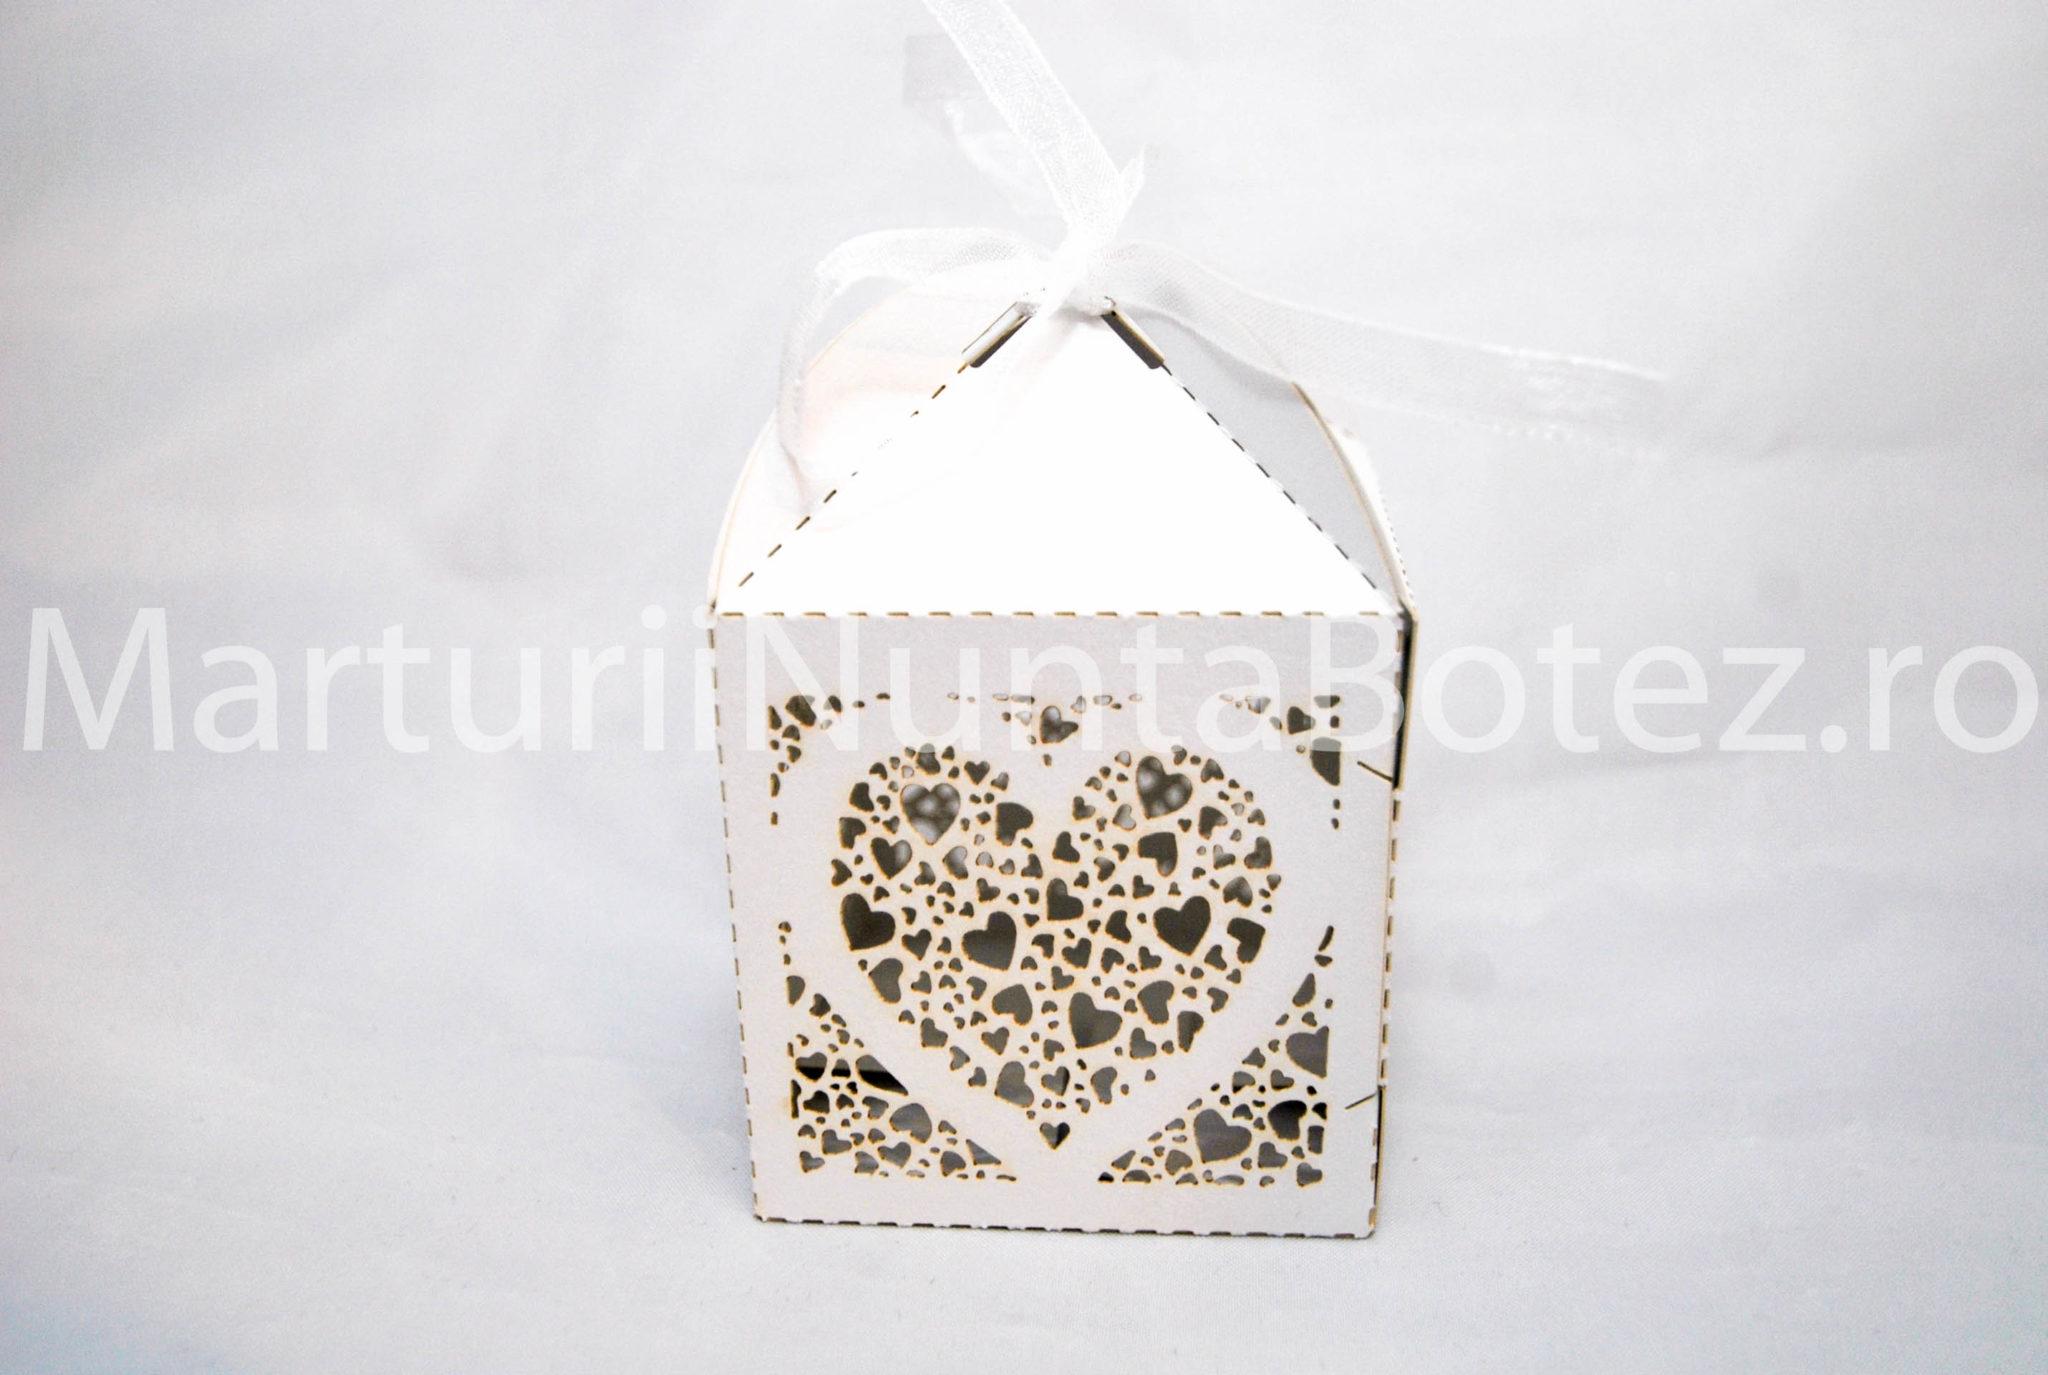 marturii_nunta_cutie_perforata_carton_model_inima_deosebita2